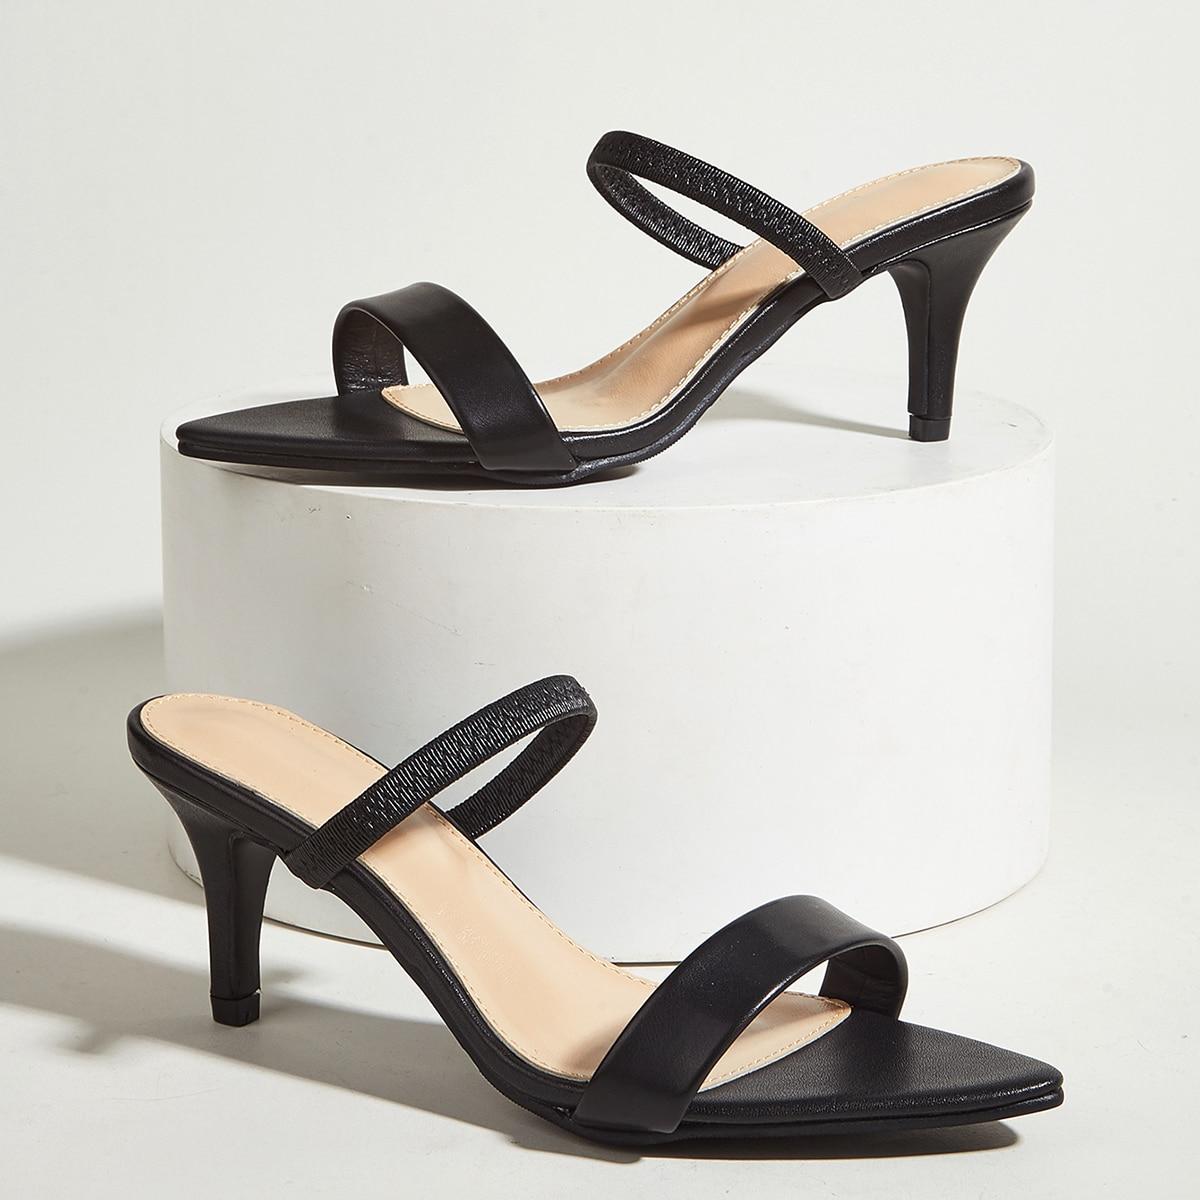 Минималистичные мюли на среднем каблуке с двойным ремешком